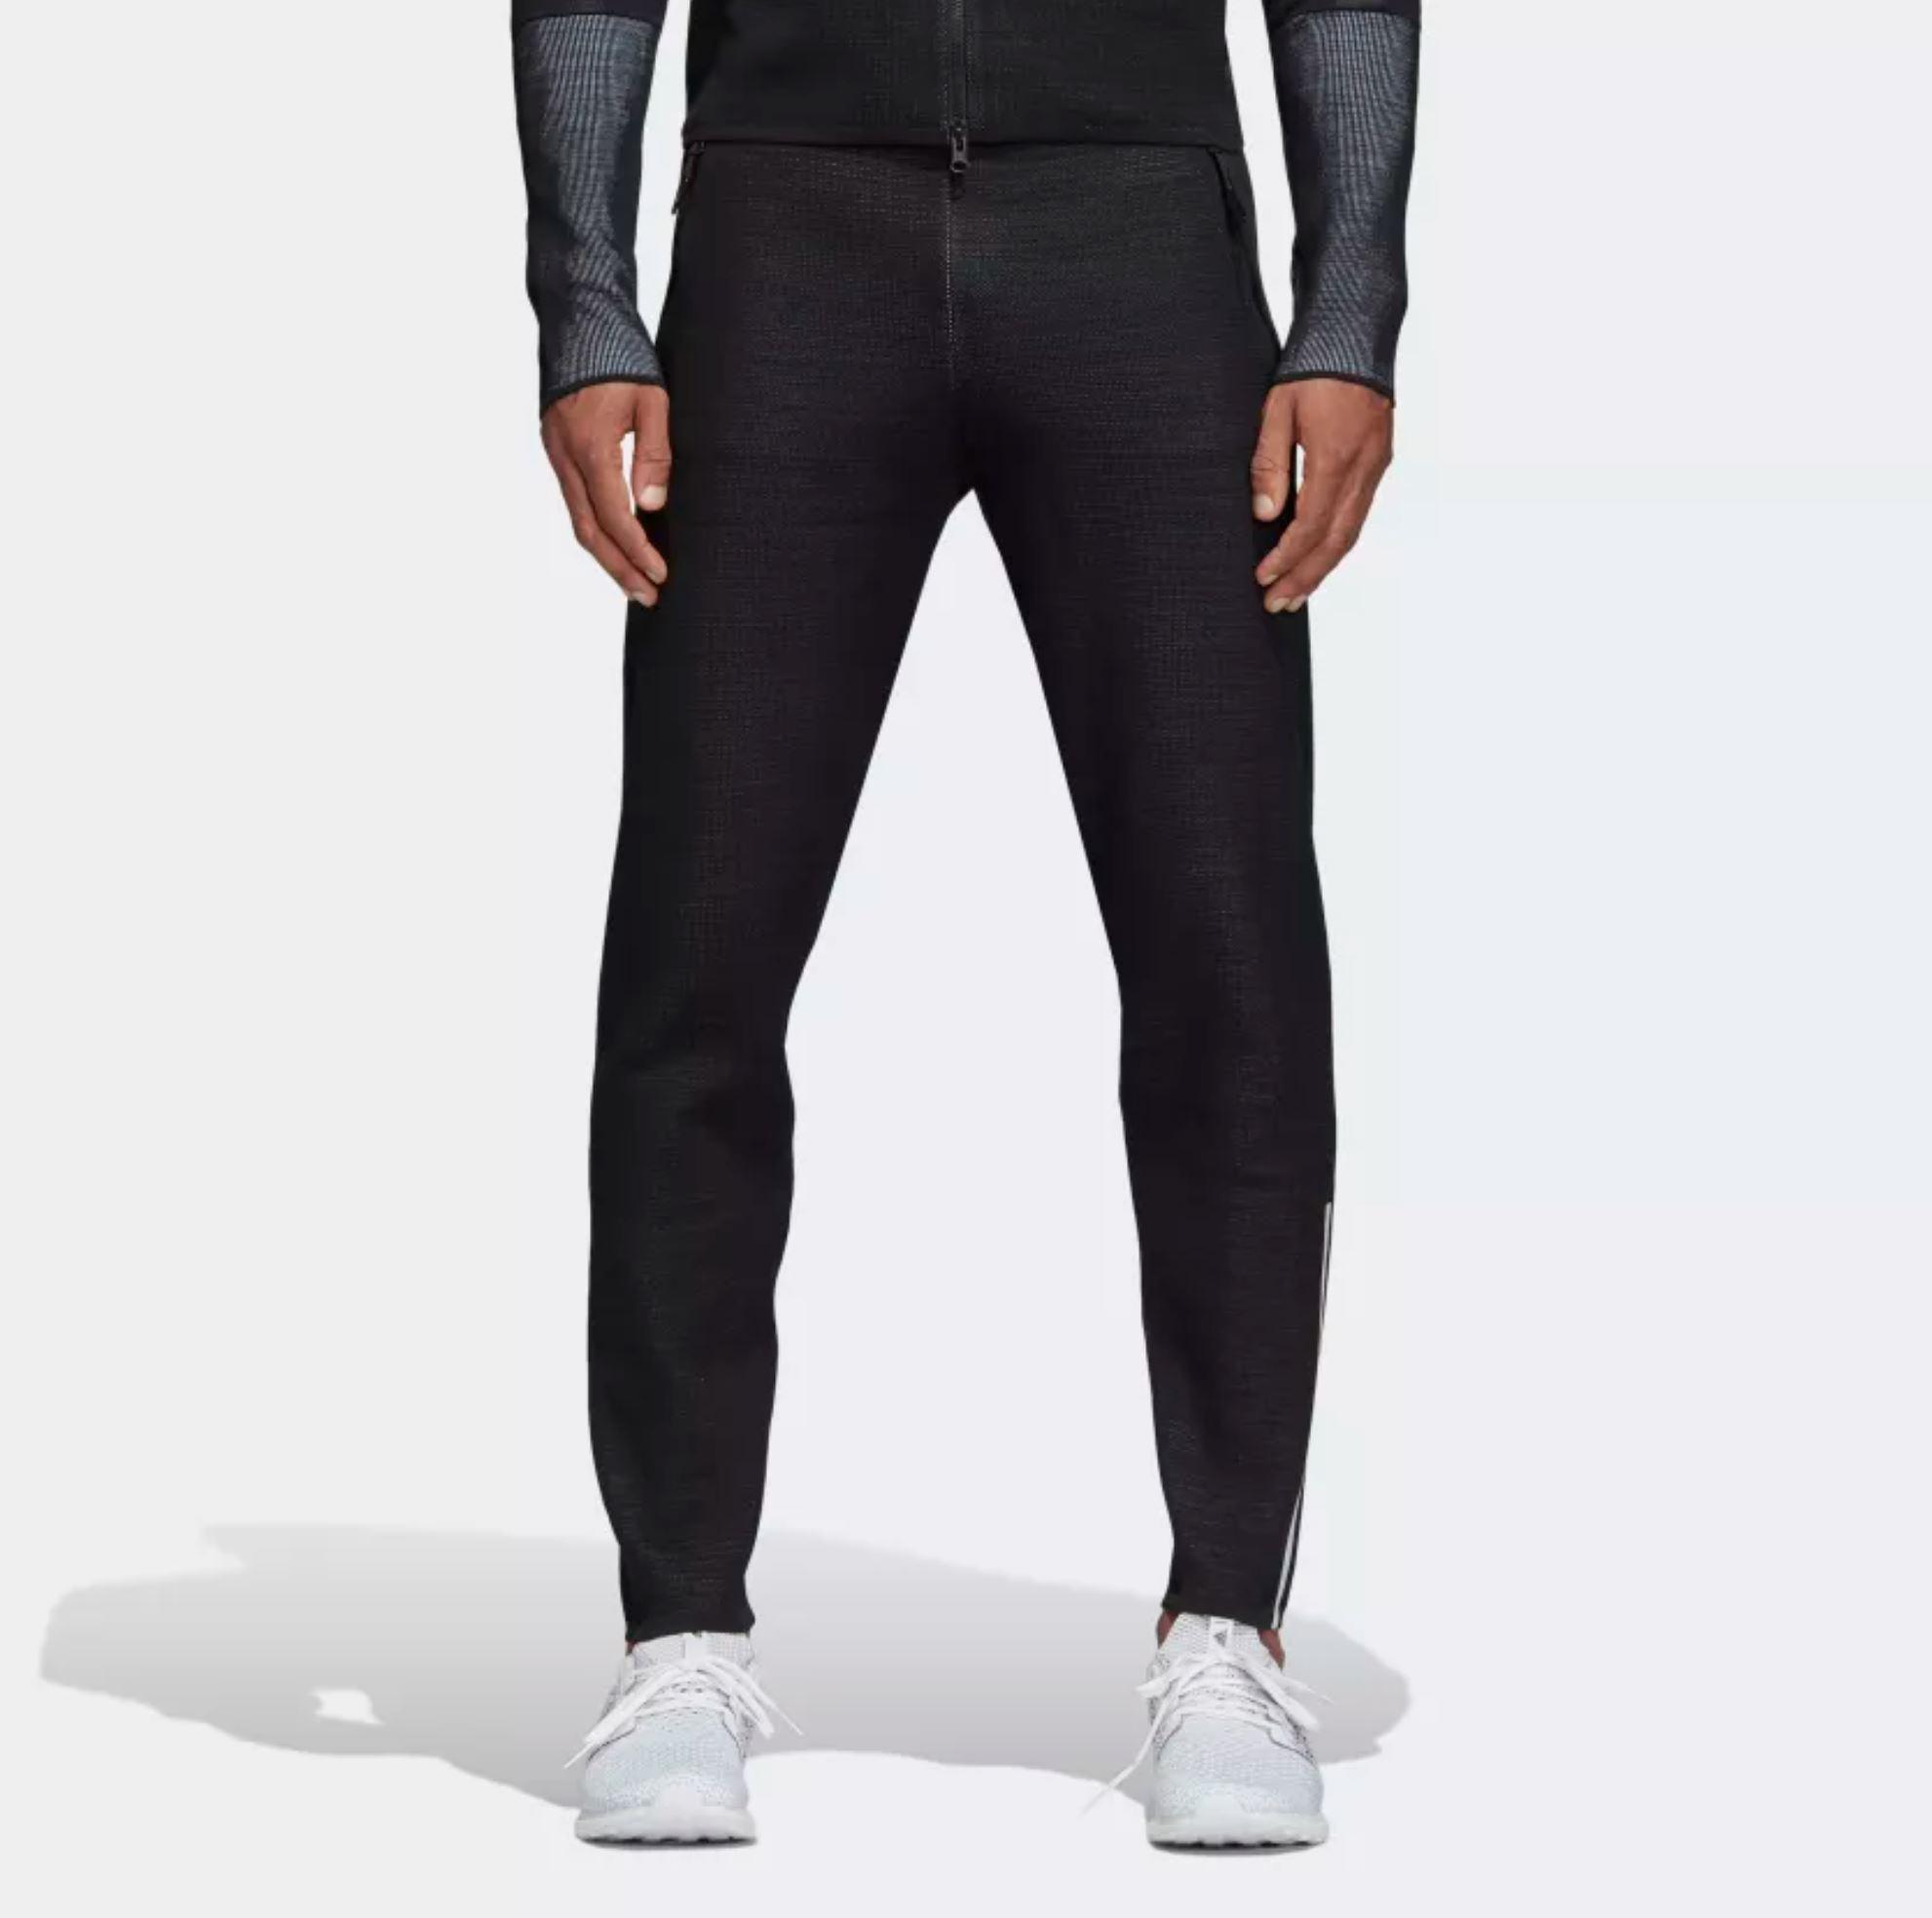 adidas ZNE pants parley black